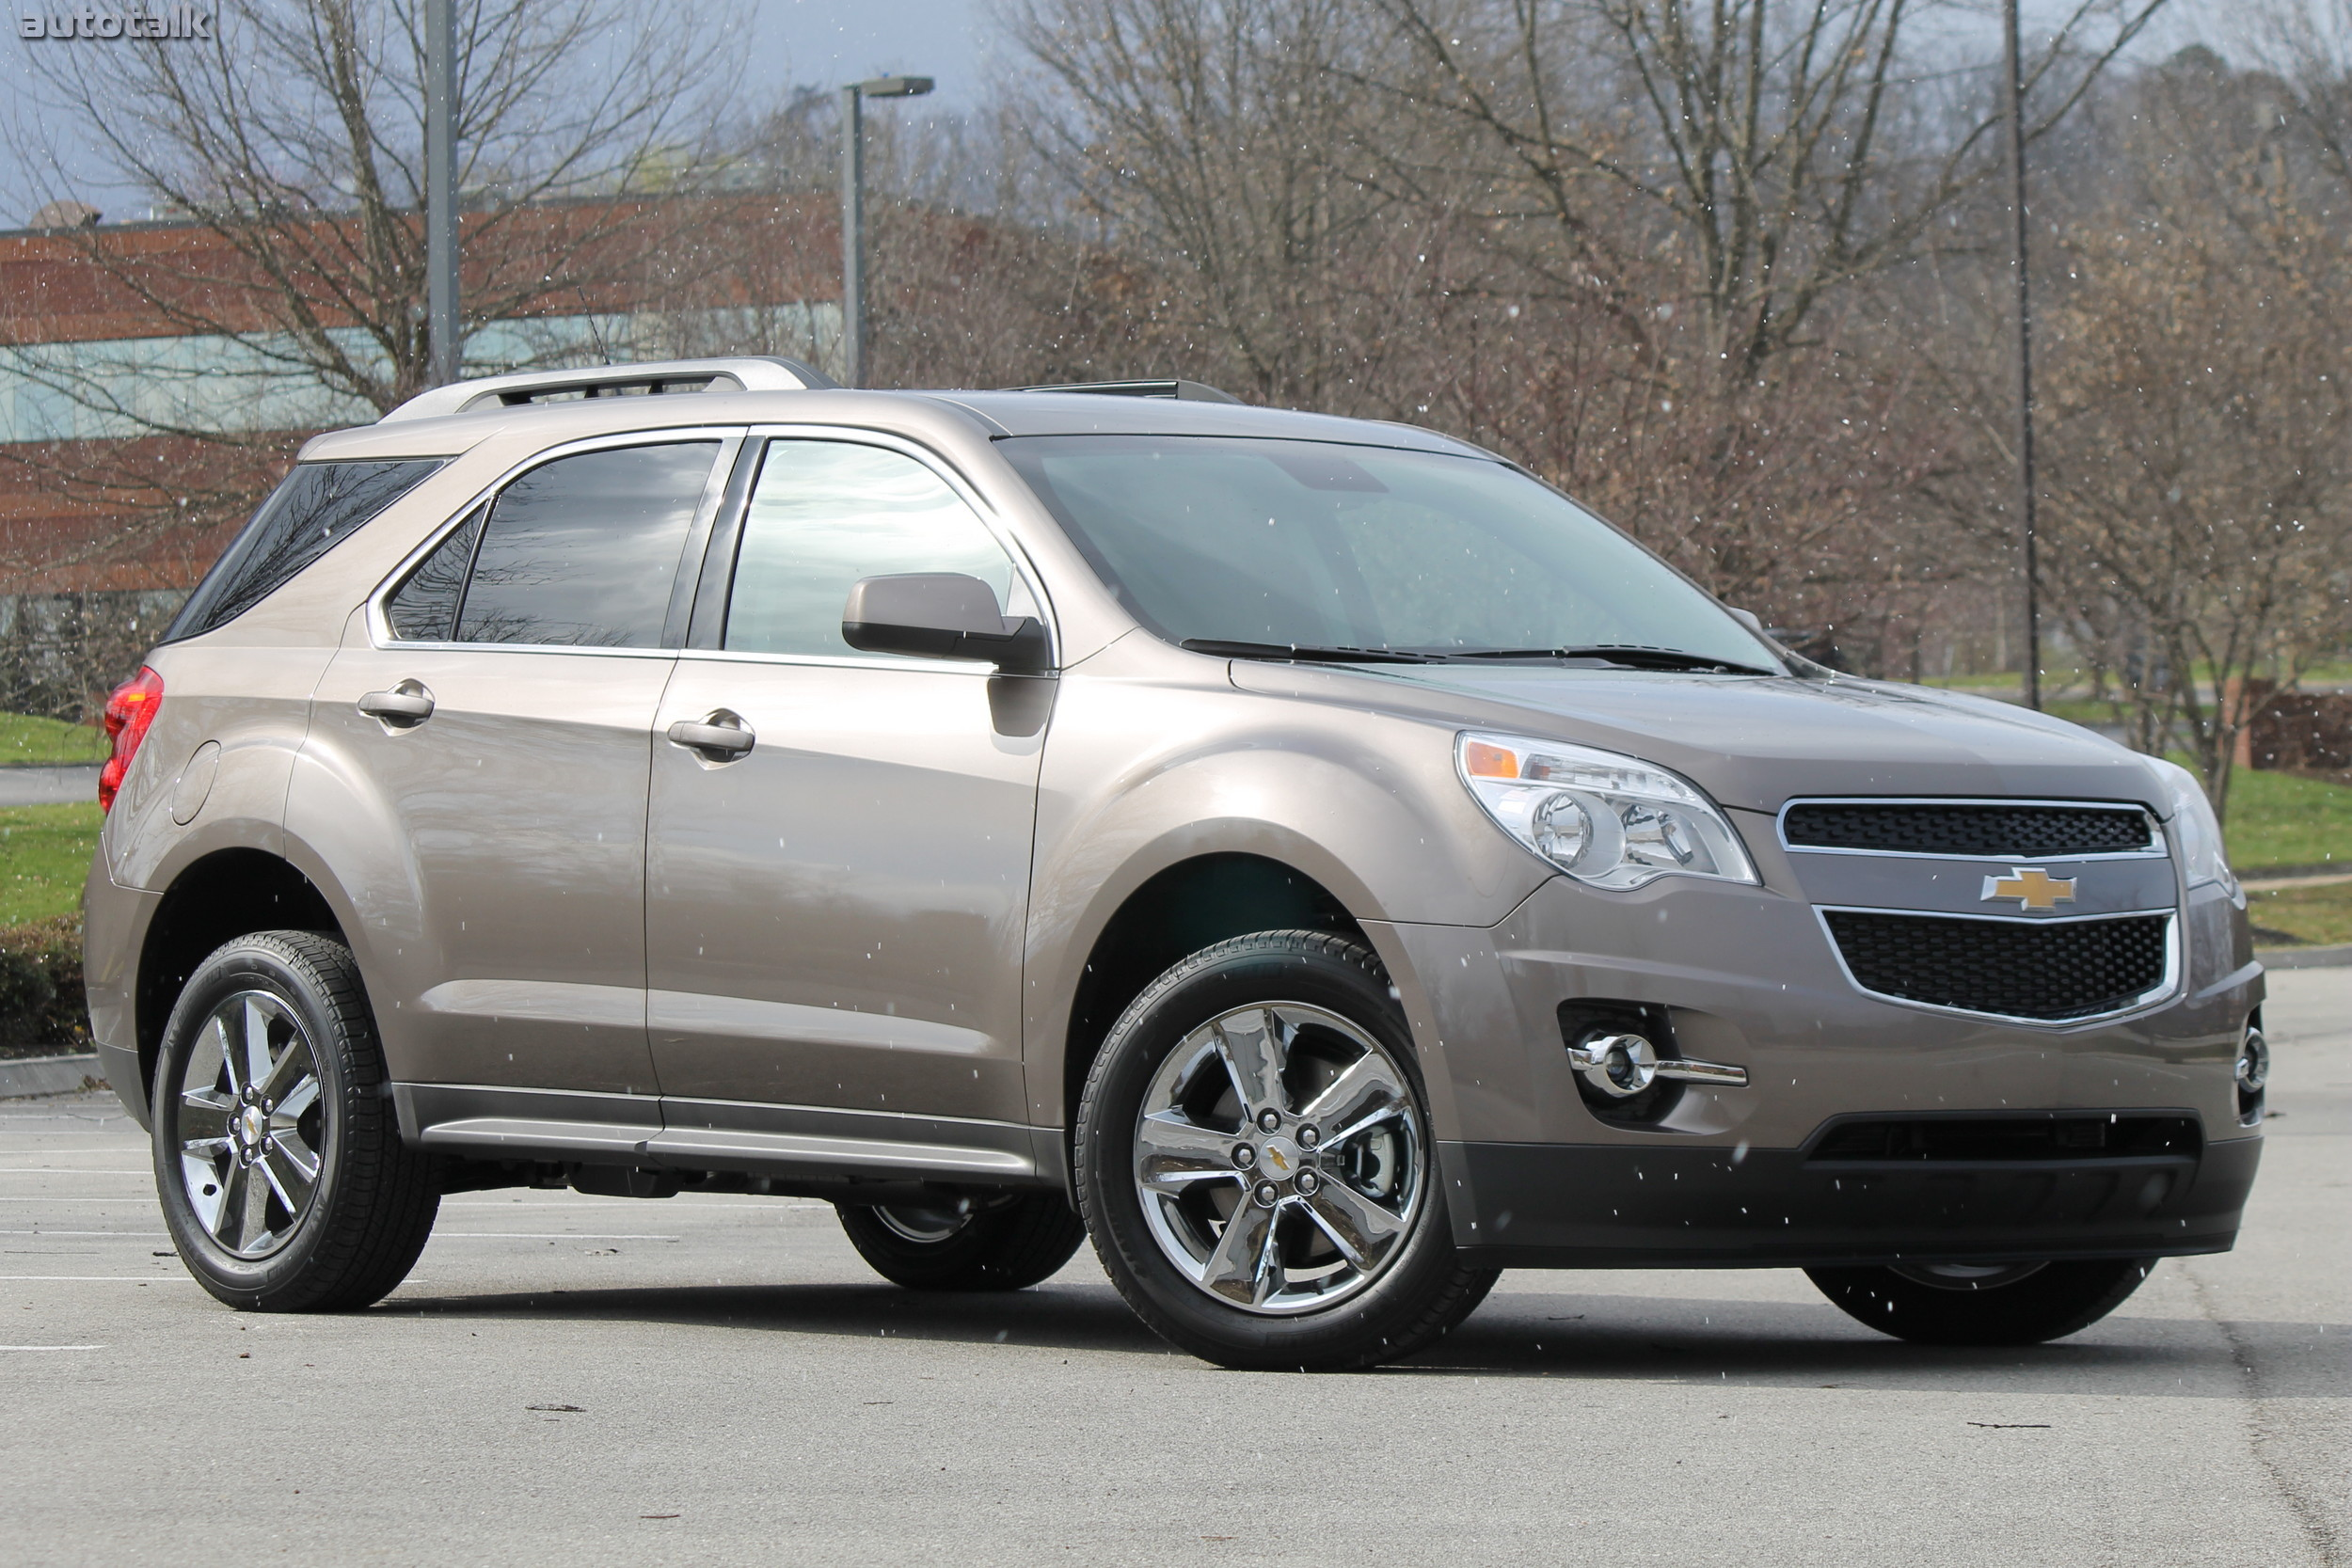 Chevy Equinox Problems >> 2012 Chevrolet Equinox Review • AutoTalk